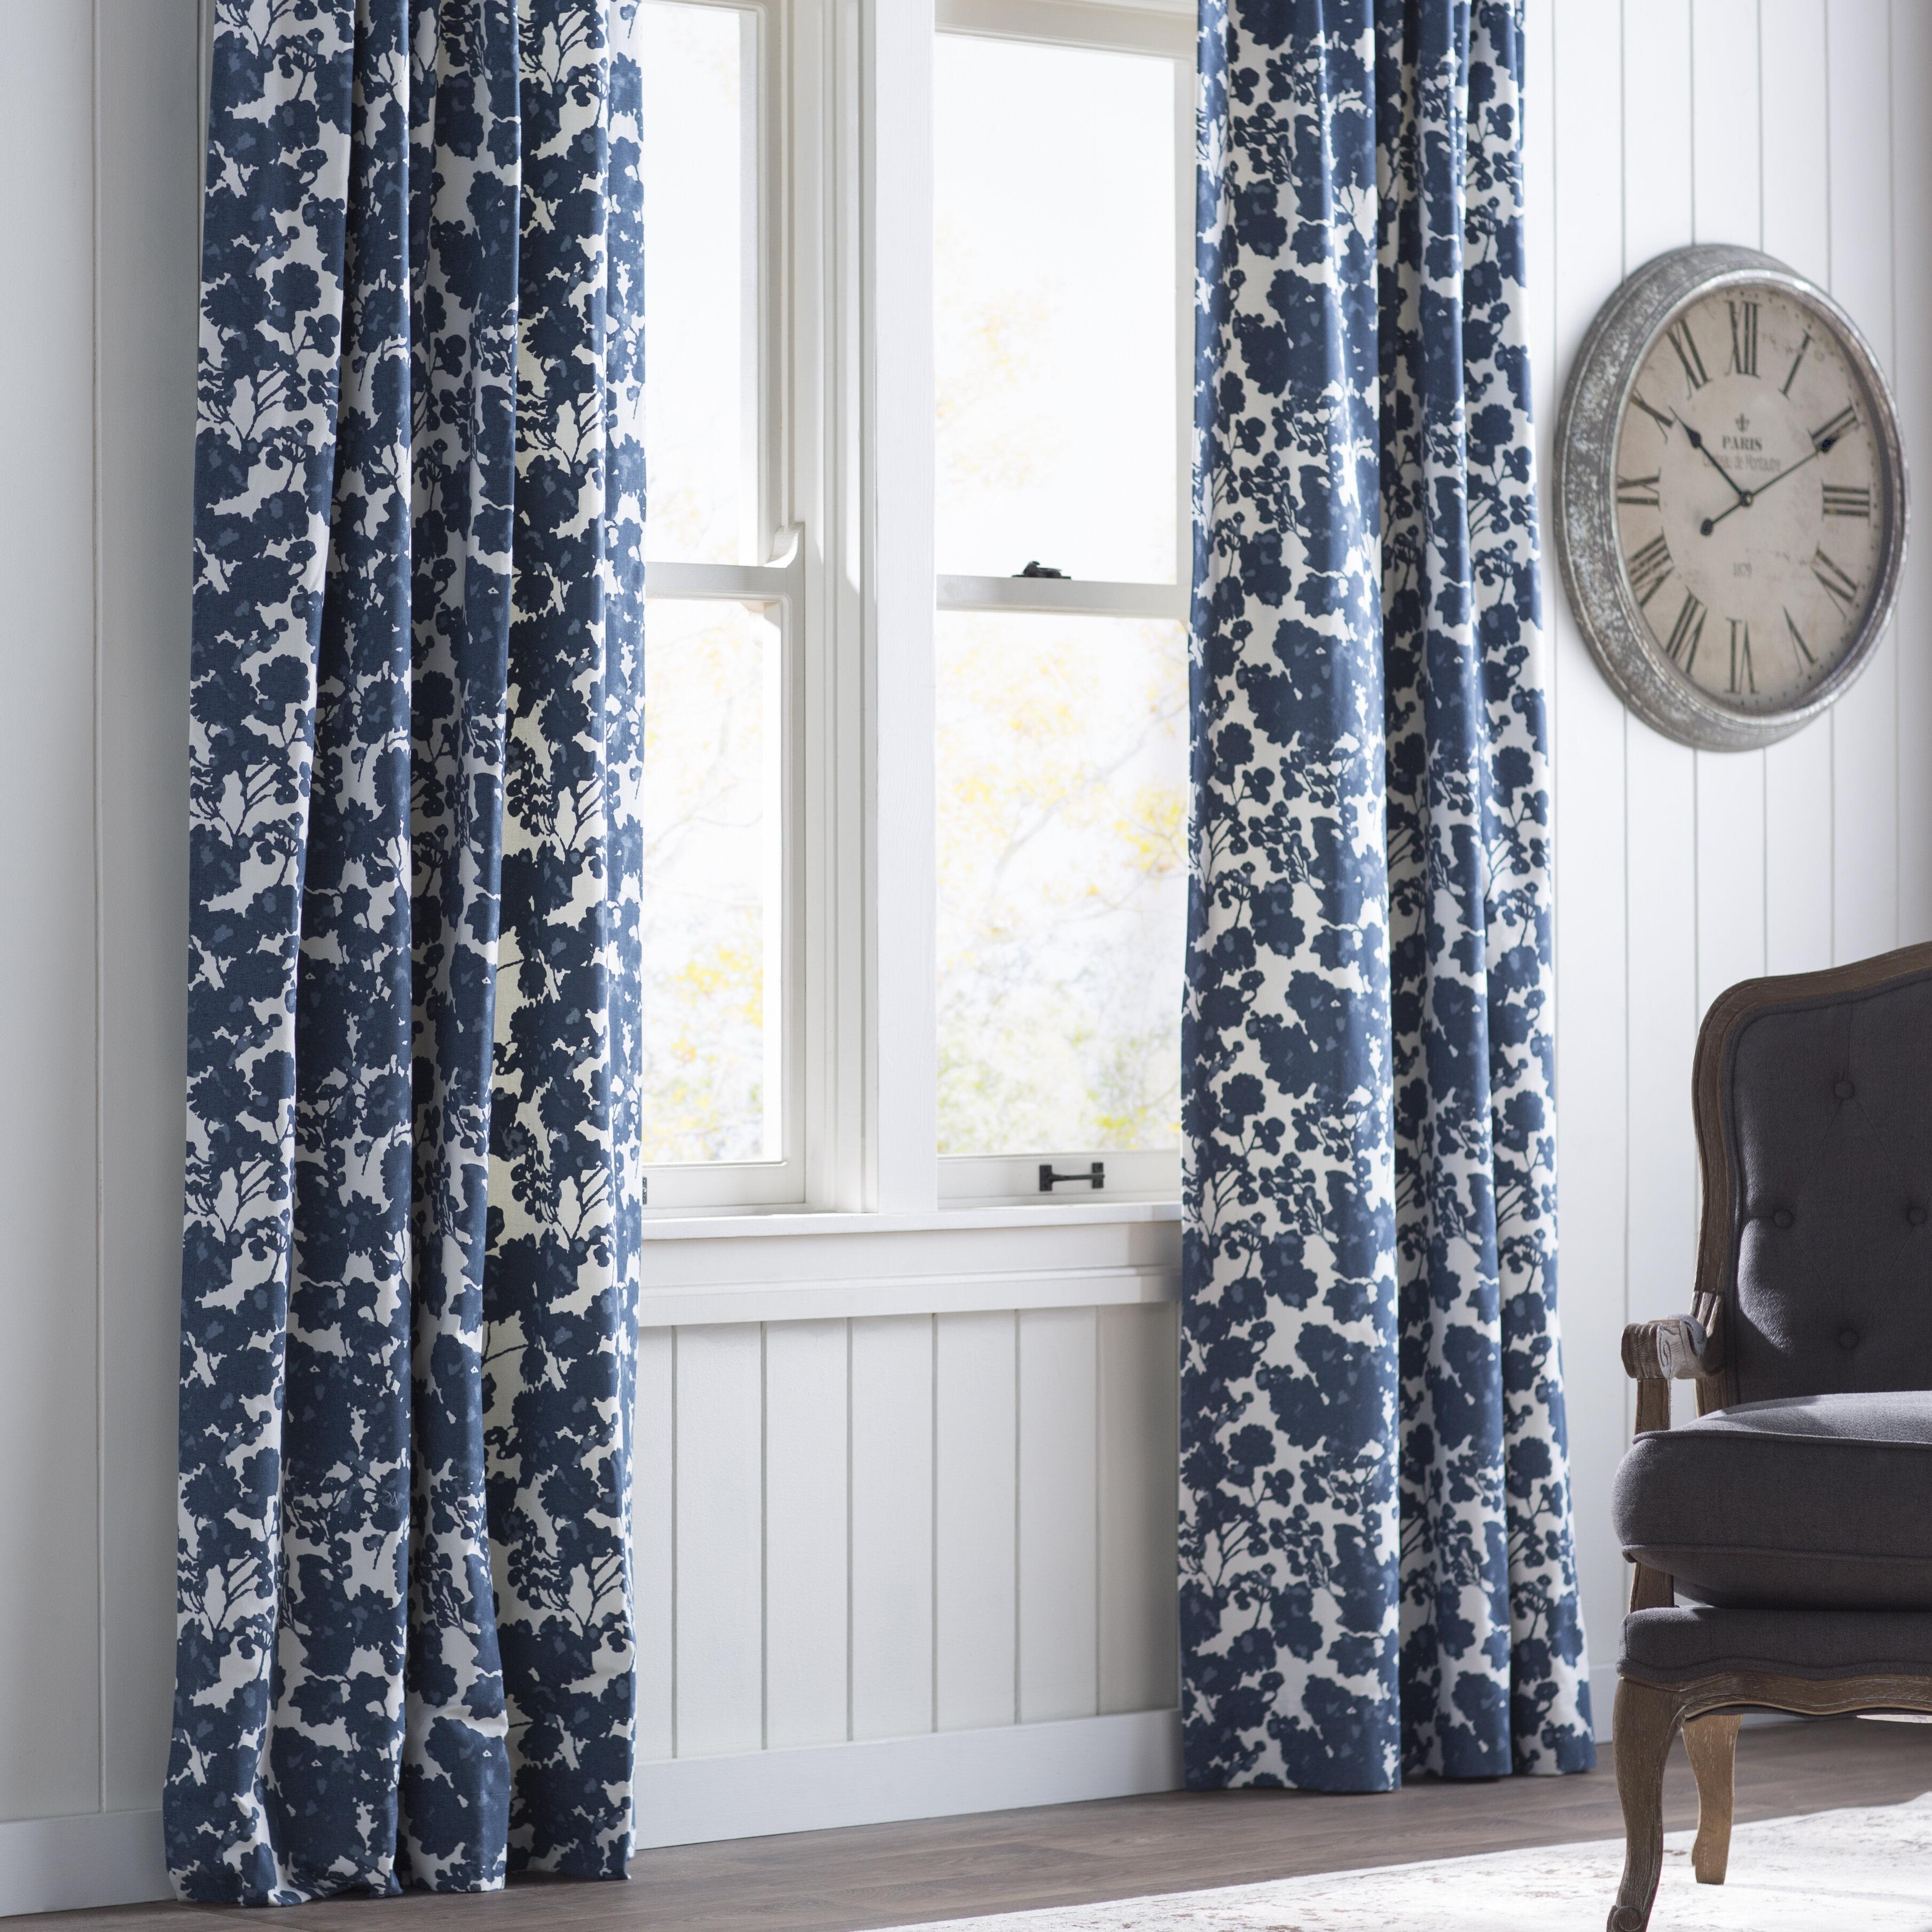 panels list colors top blair off set curtains jacquard damask with curtain of drapes floral grommet sage